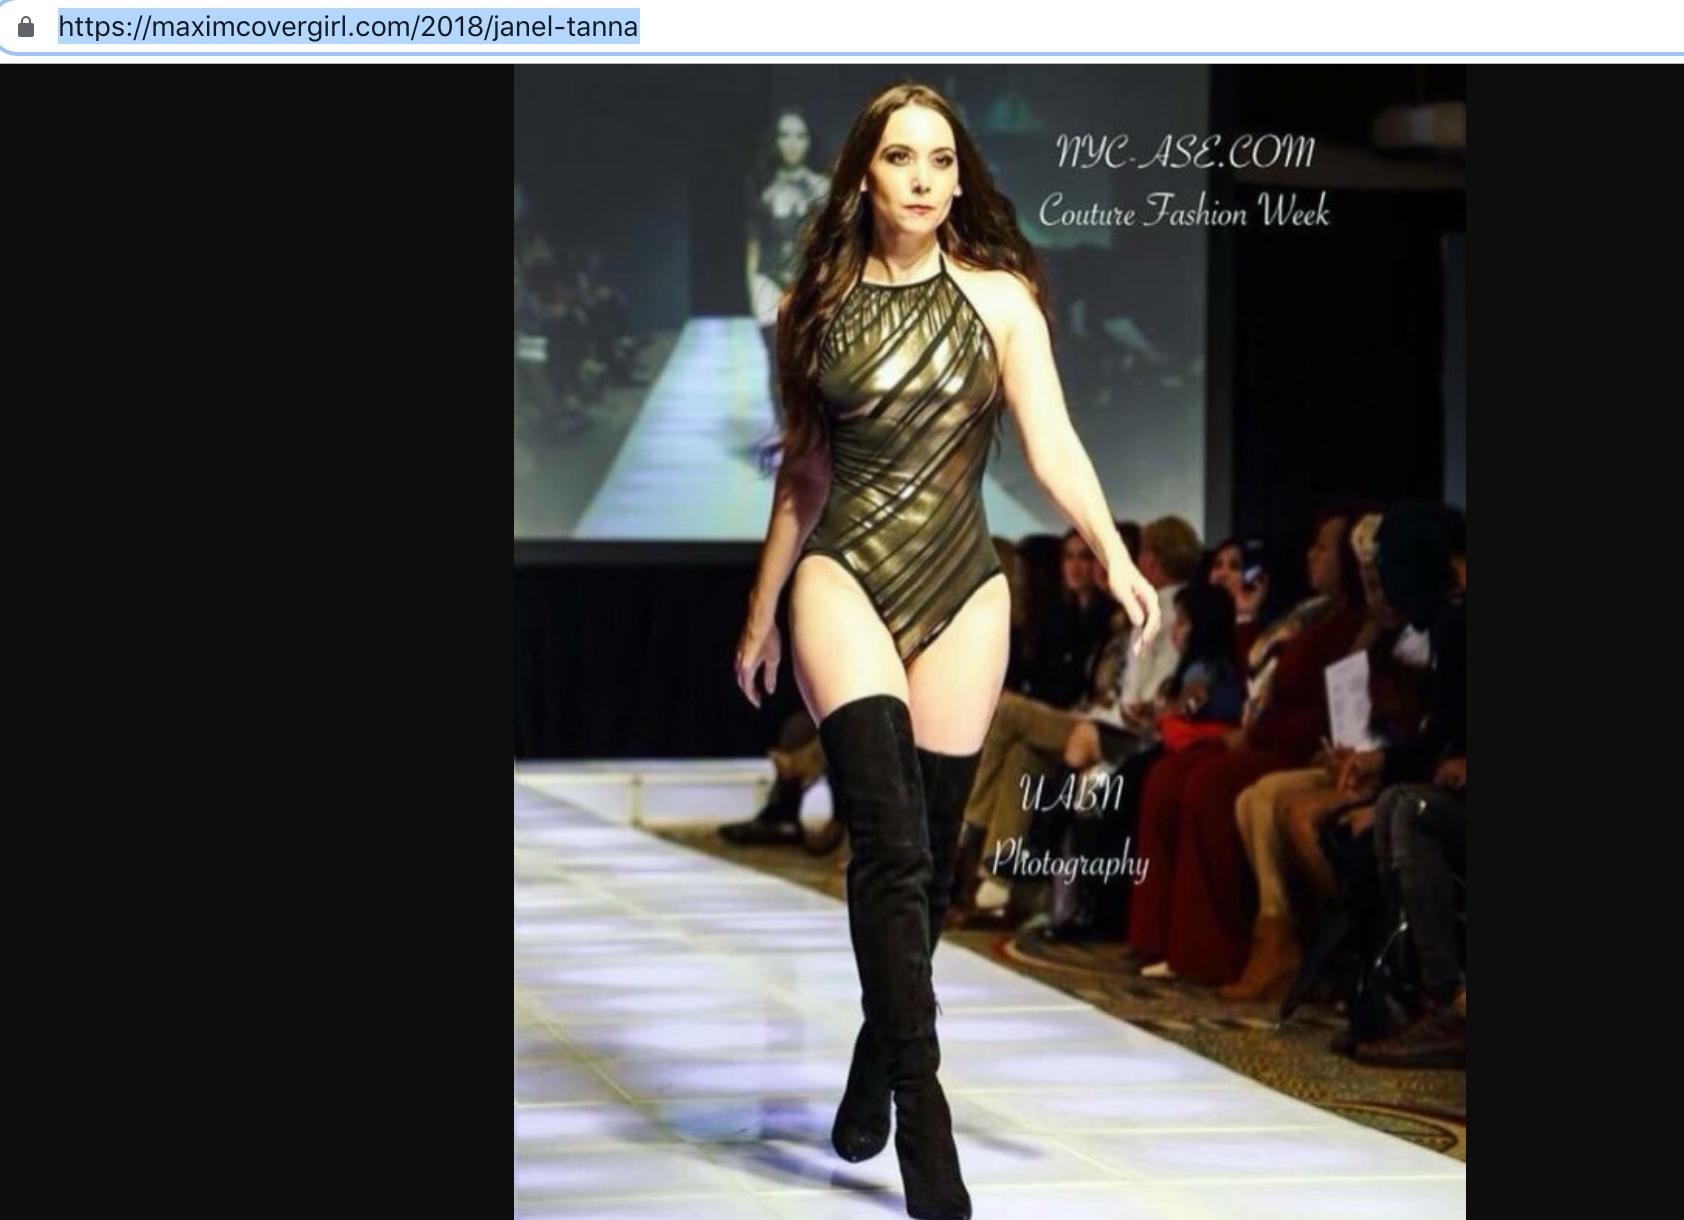 Janel-Tanna-Maxim-Covergirl.jpg